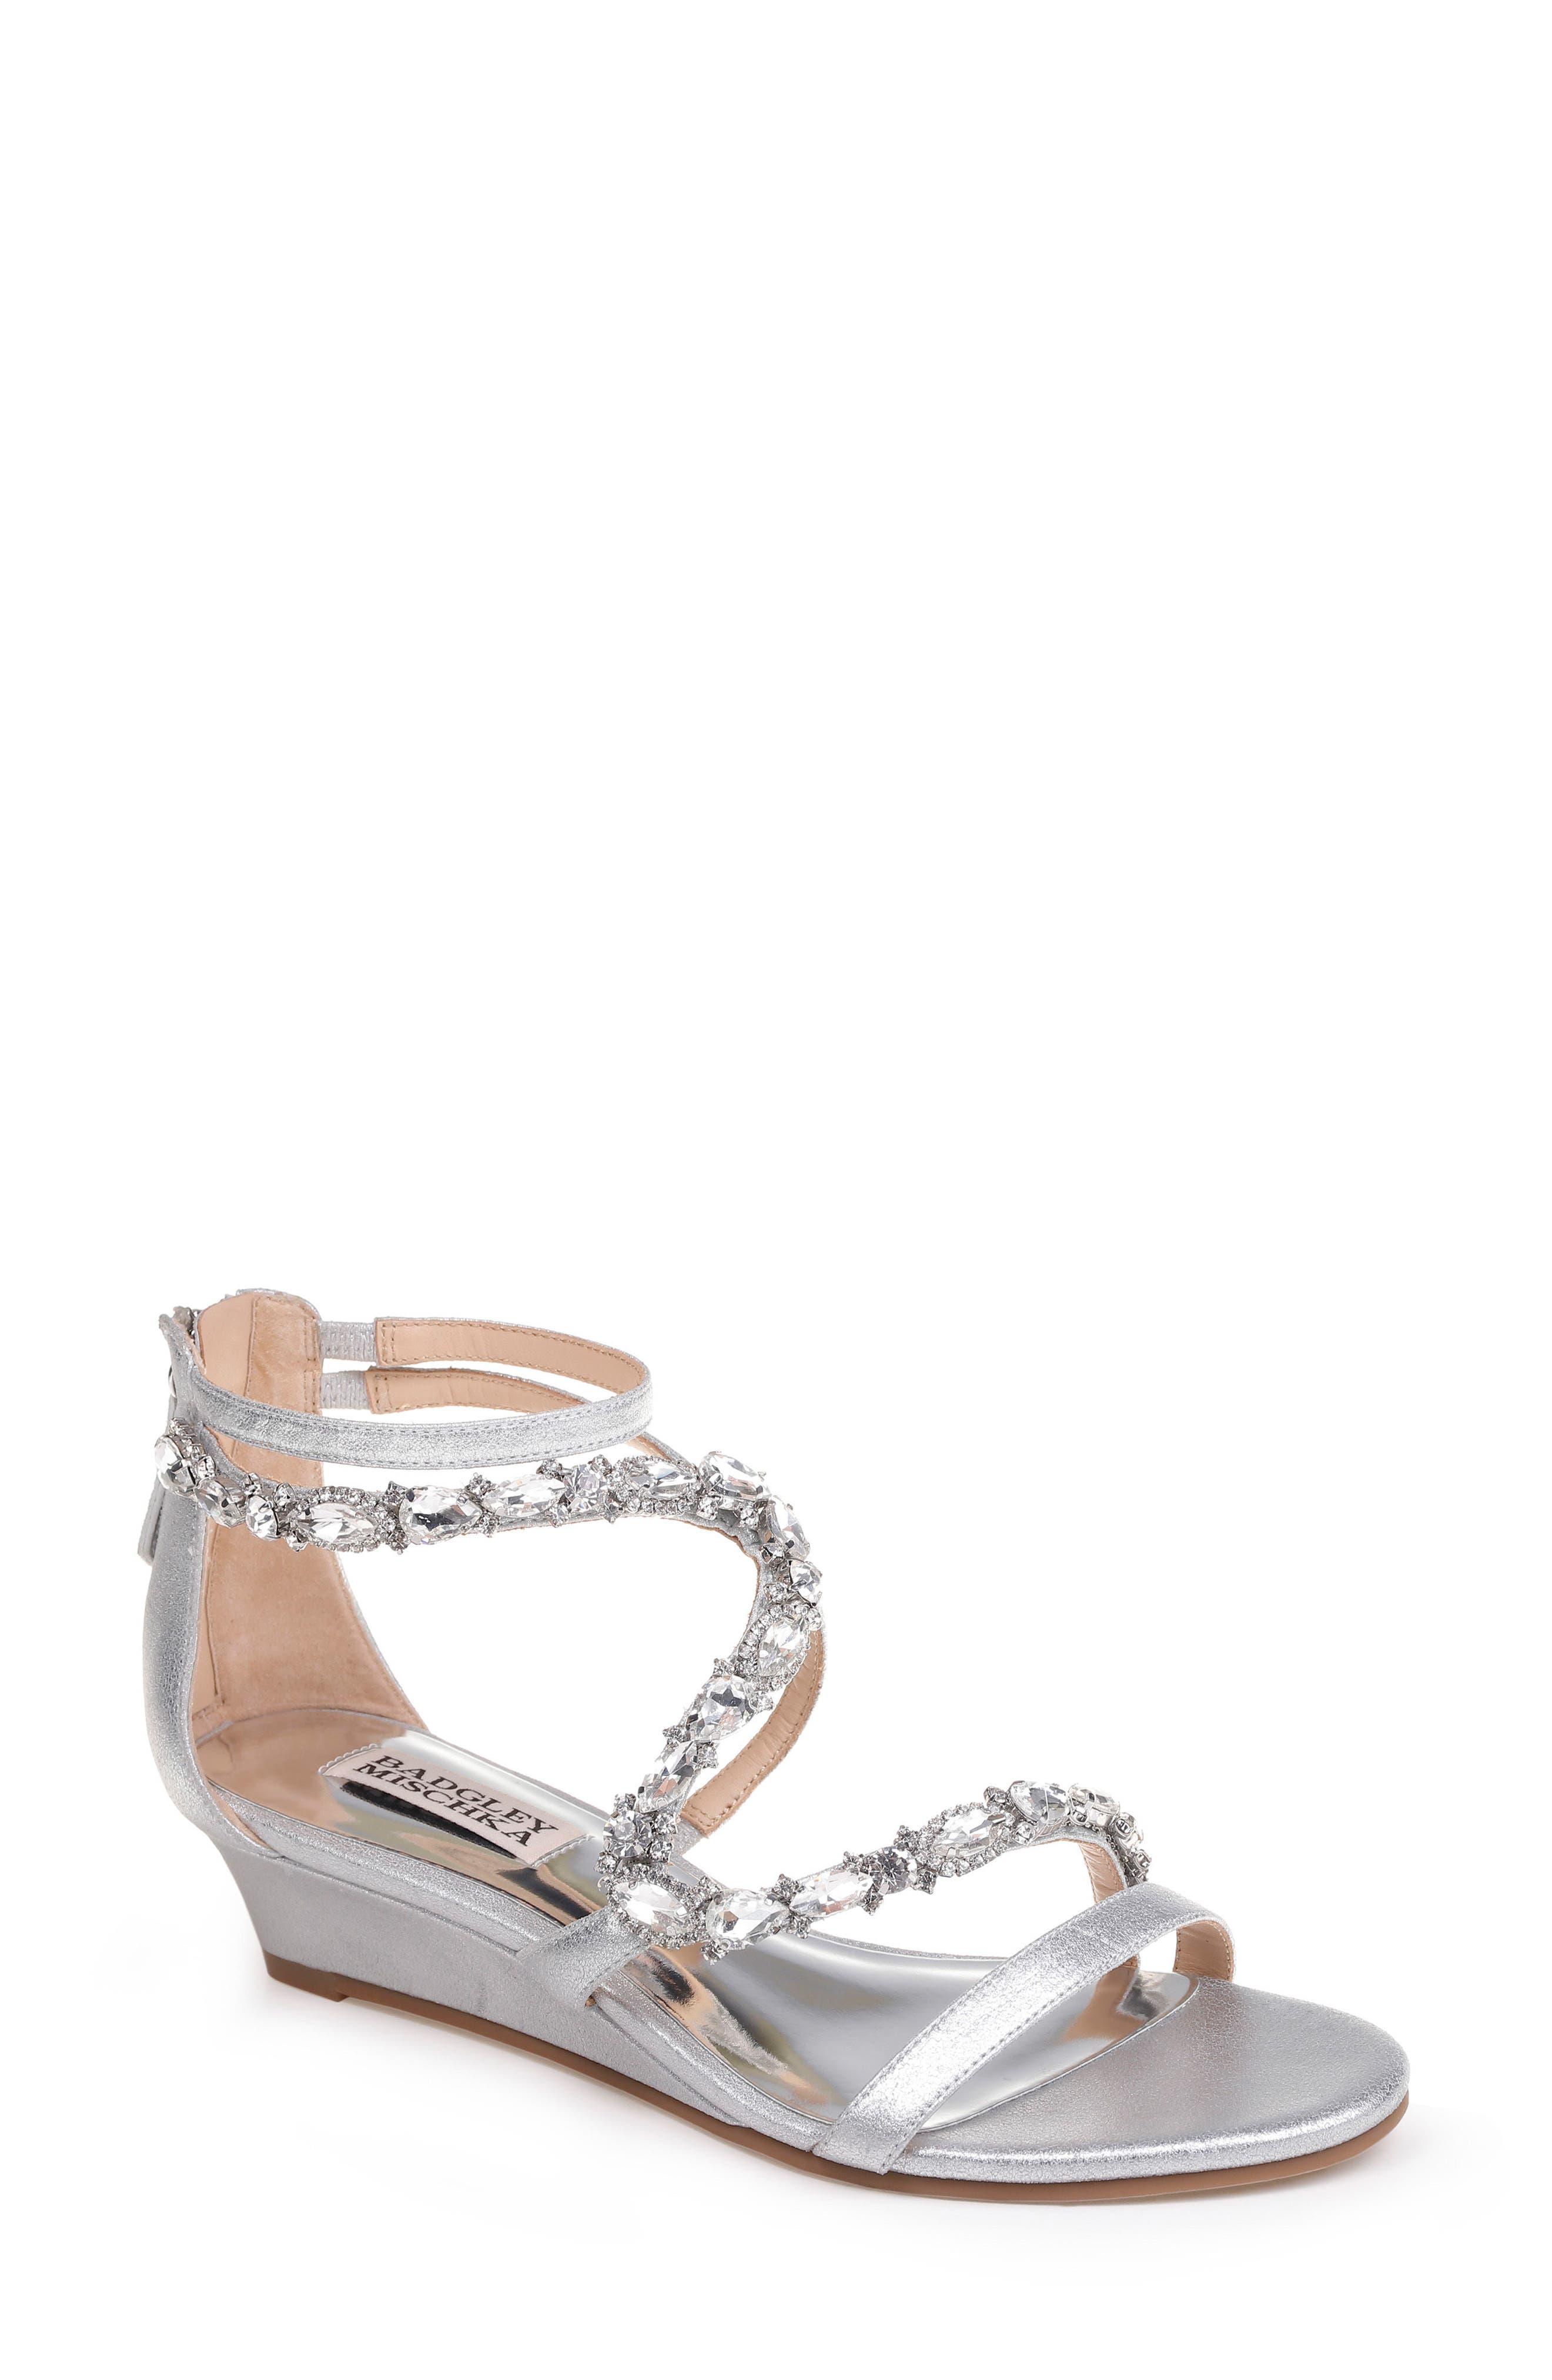 Main Image - Badgley Mischka Sierra Strappy Wedge Sandal (Women)